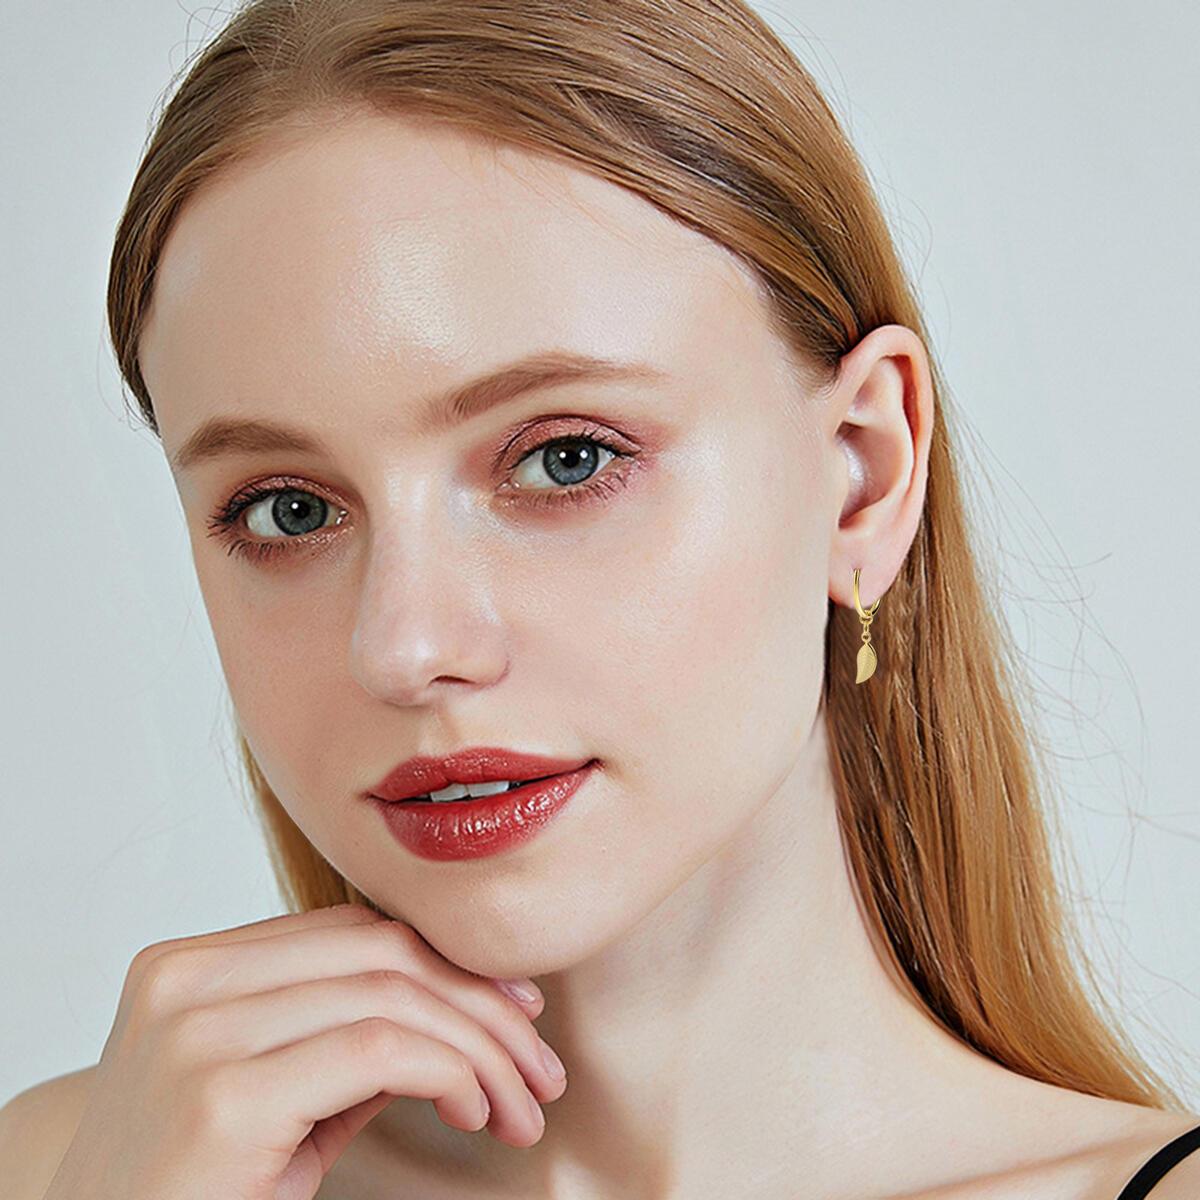 YeGieonr Small Dangle Hoop Earrings -Leaf Hoop Earrings -925 Sterling Silver with 14k Gold Plated,Minimalist Dainty Huggie Hoop Earrings with Tiny Charms For Women/girls/teens